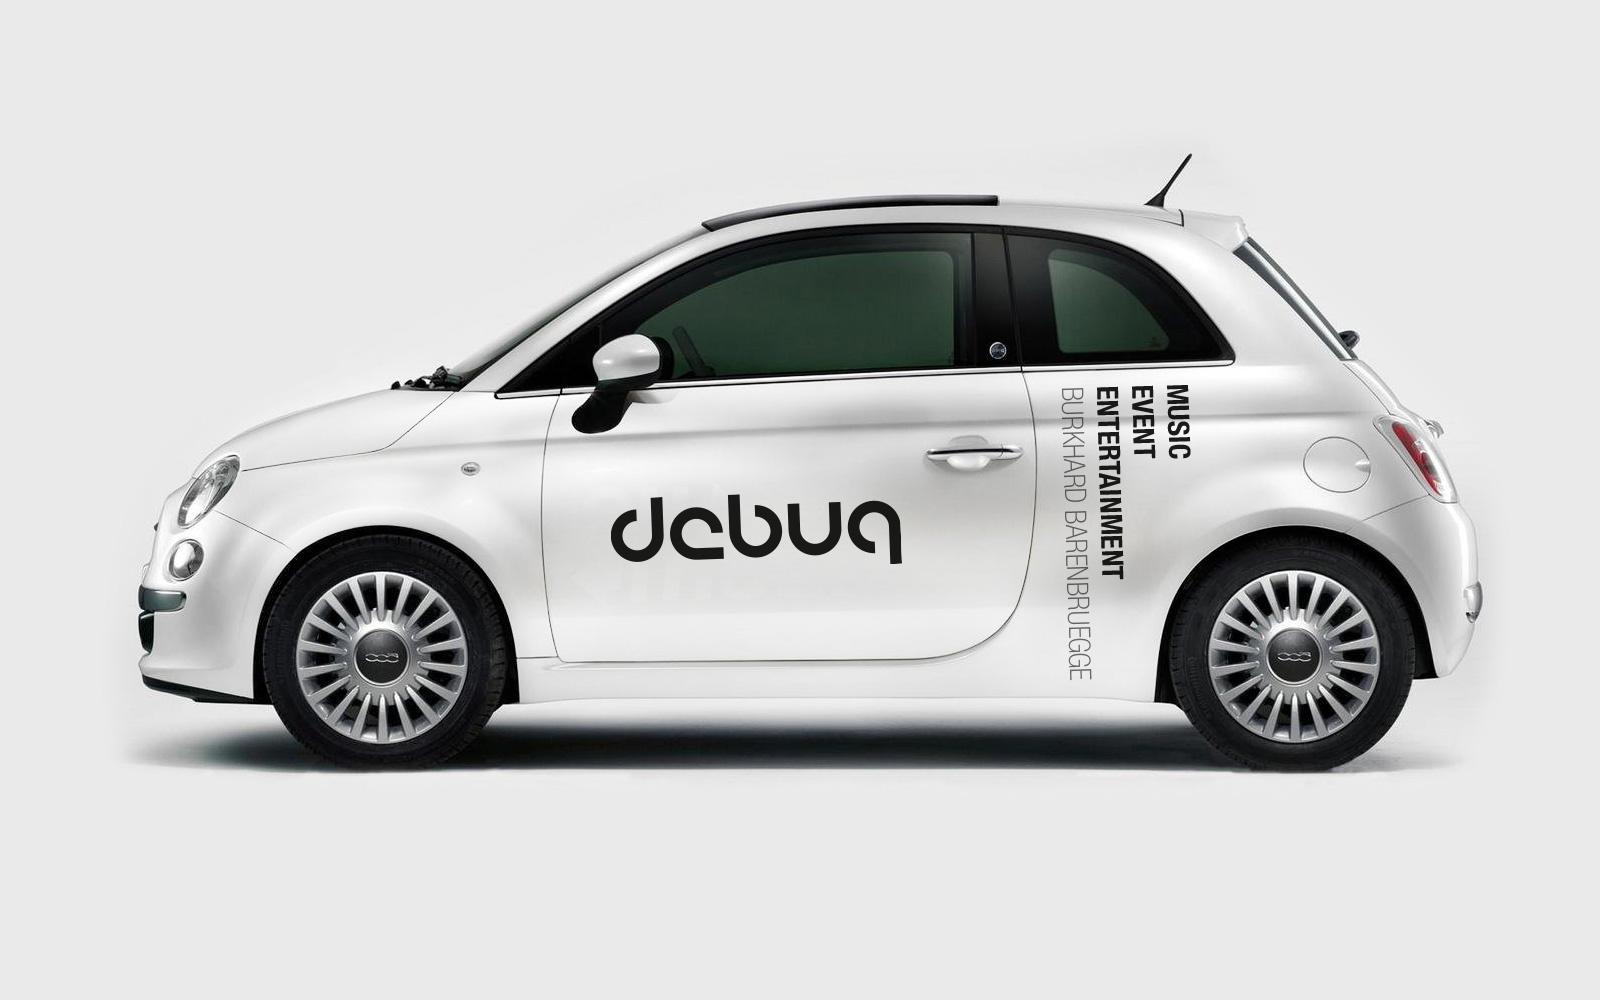 debug_1600p_auto